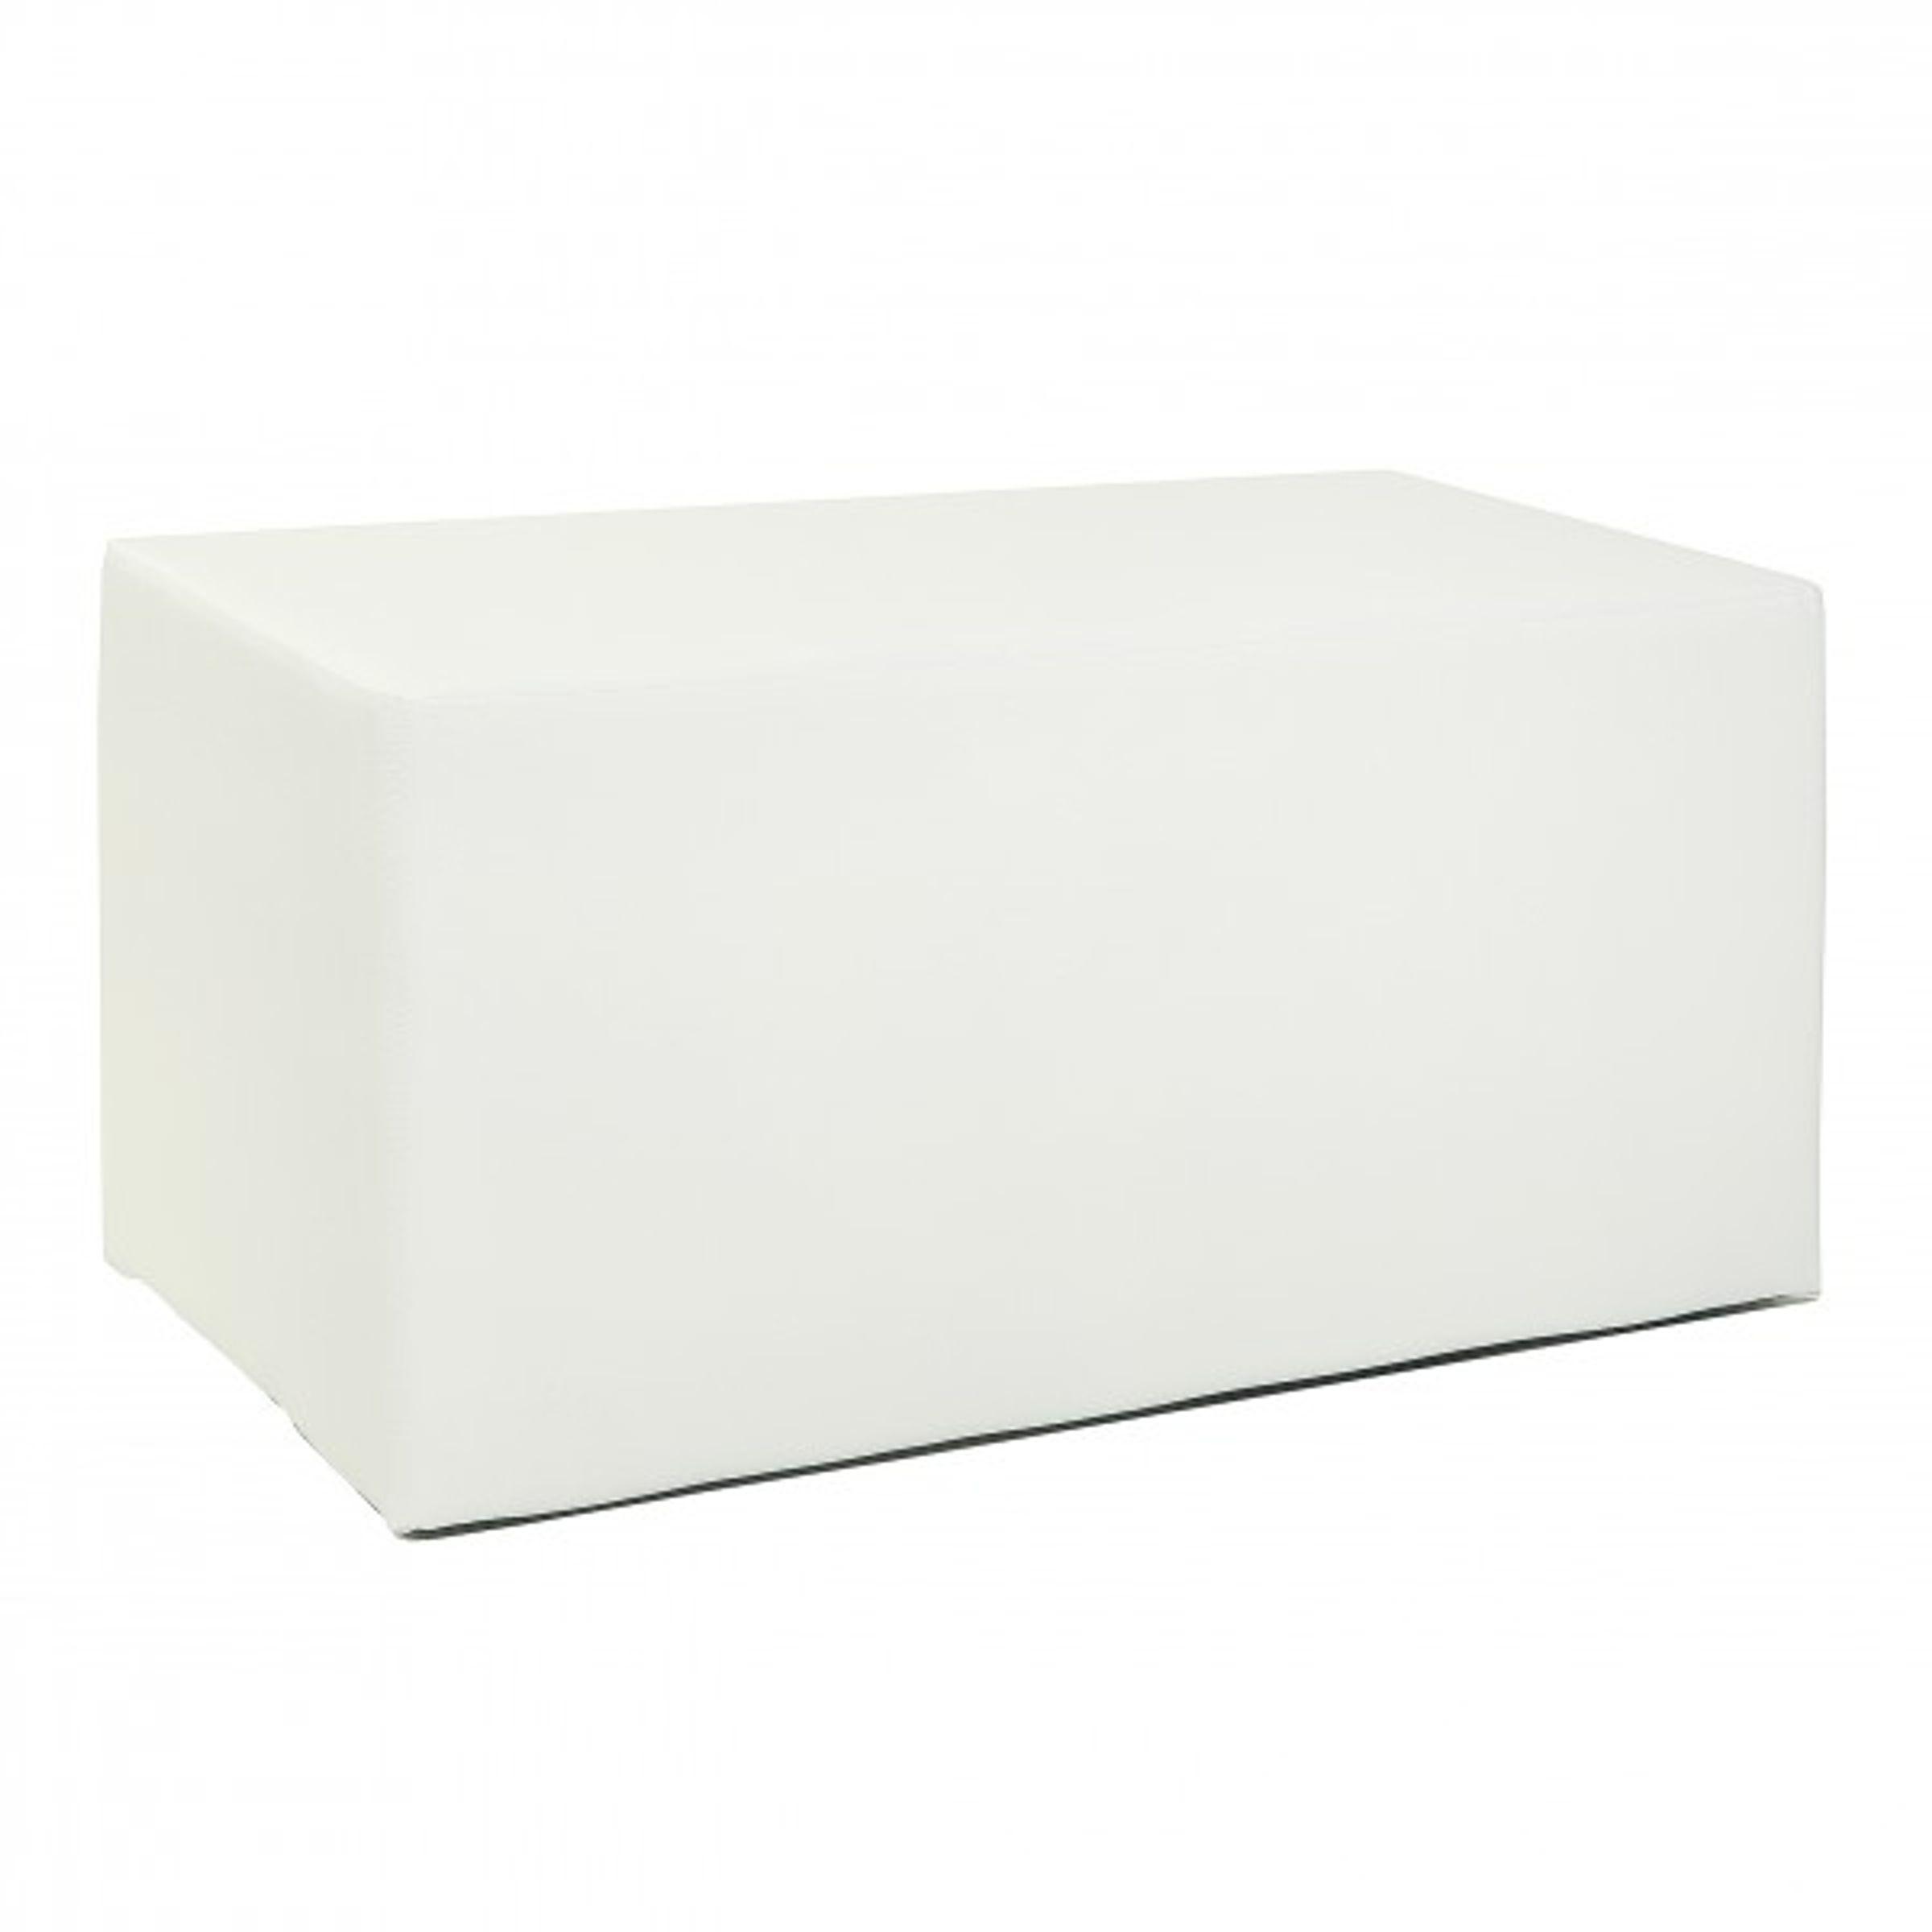 sitzw rfel kubus ii hocker kunstleder sitzbank 90x45x45 cm. Black Bedroom Furniture Sets. Home Design Ideas